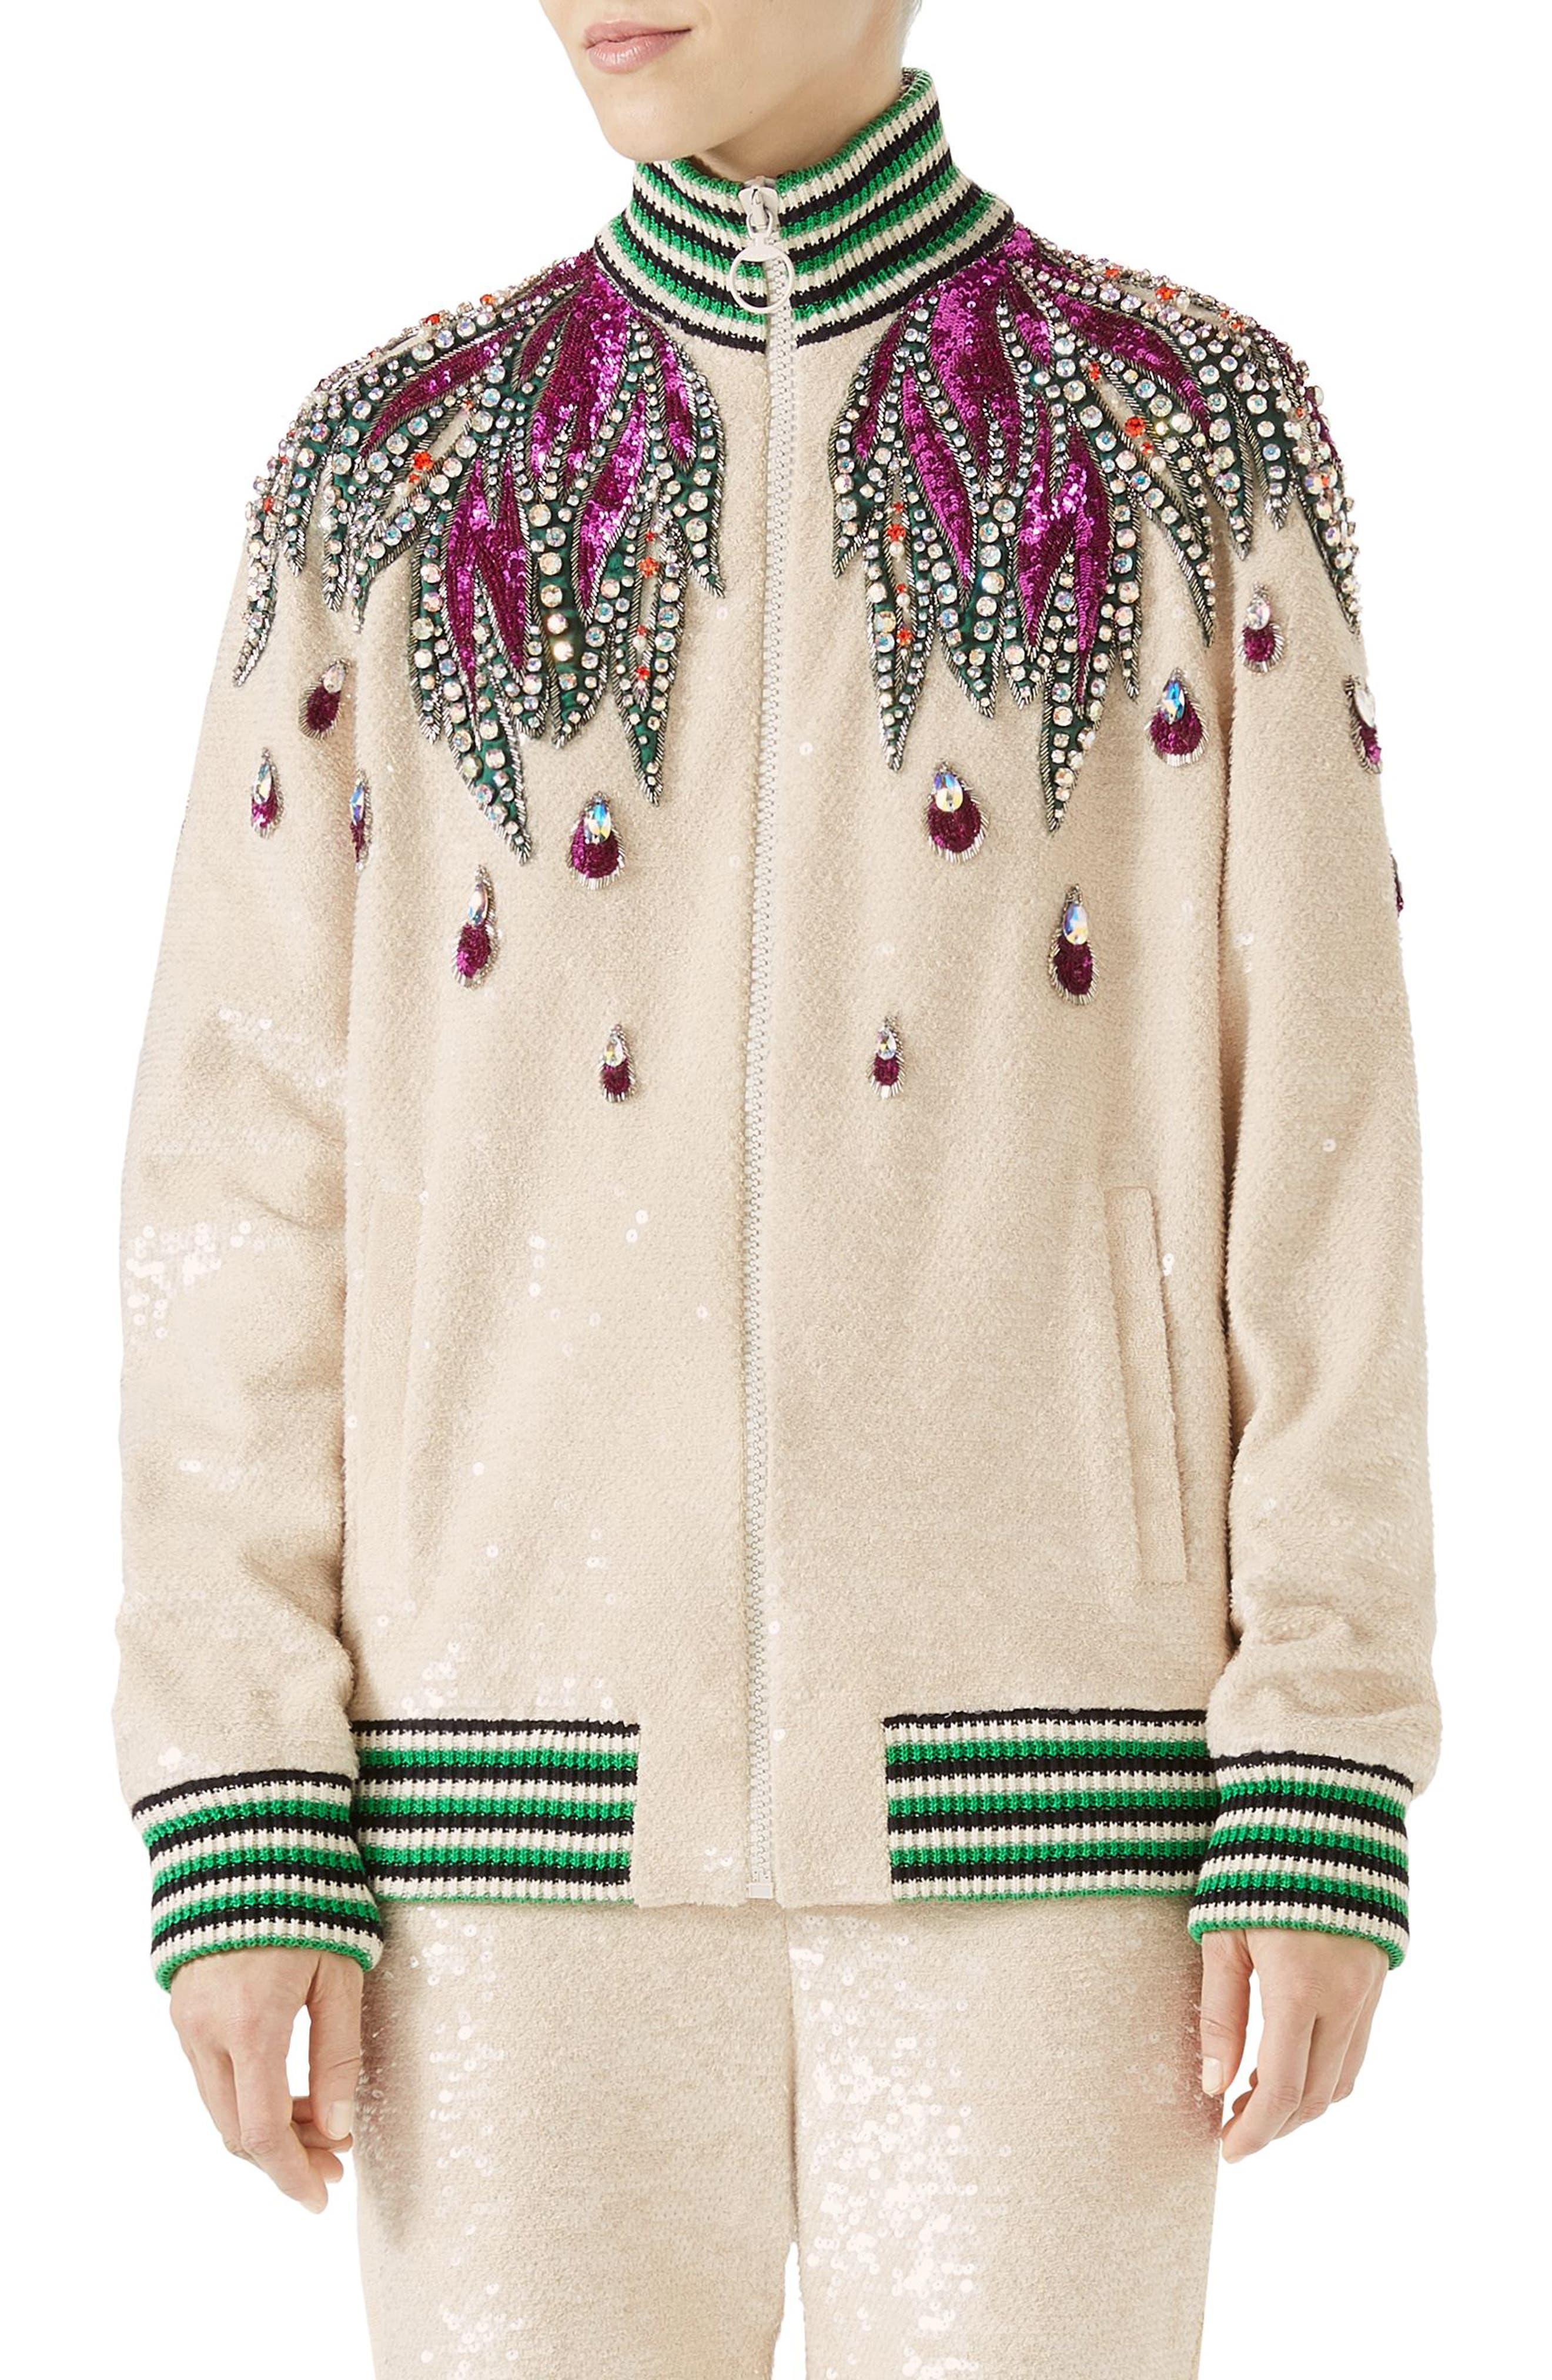 Embellished Track Jacket,                             Main thumbnail 1, color,                             195